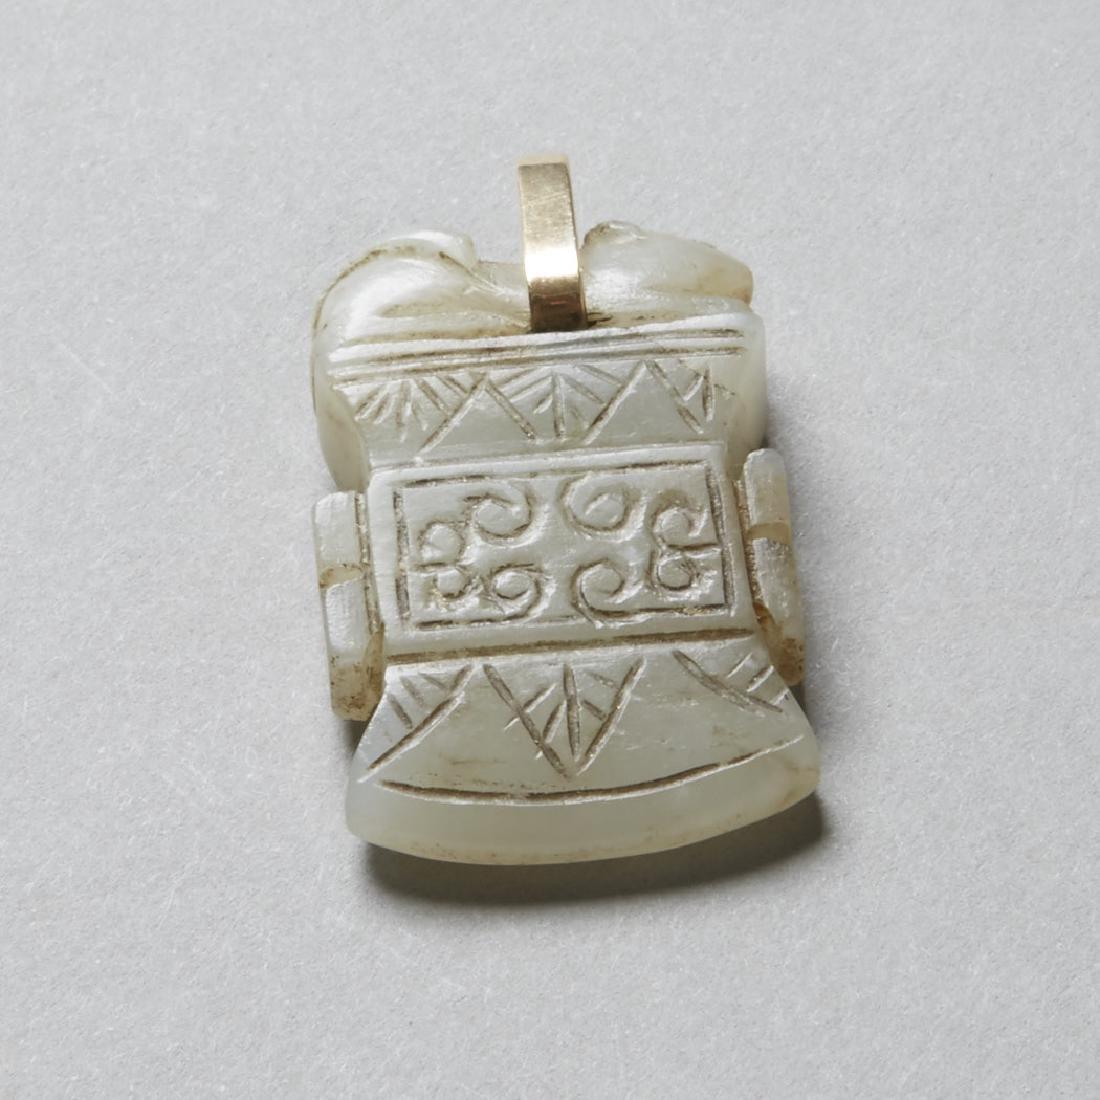 Chinese 19th Jade Pendant Archaic Axe Head - BTC Acpt - 2